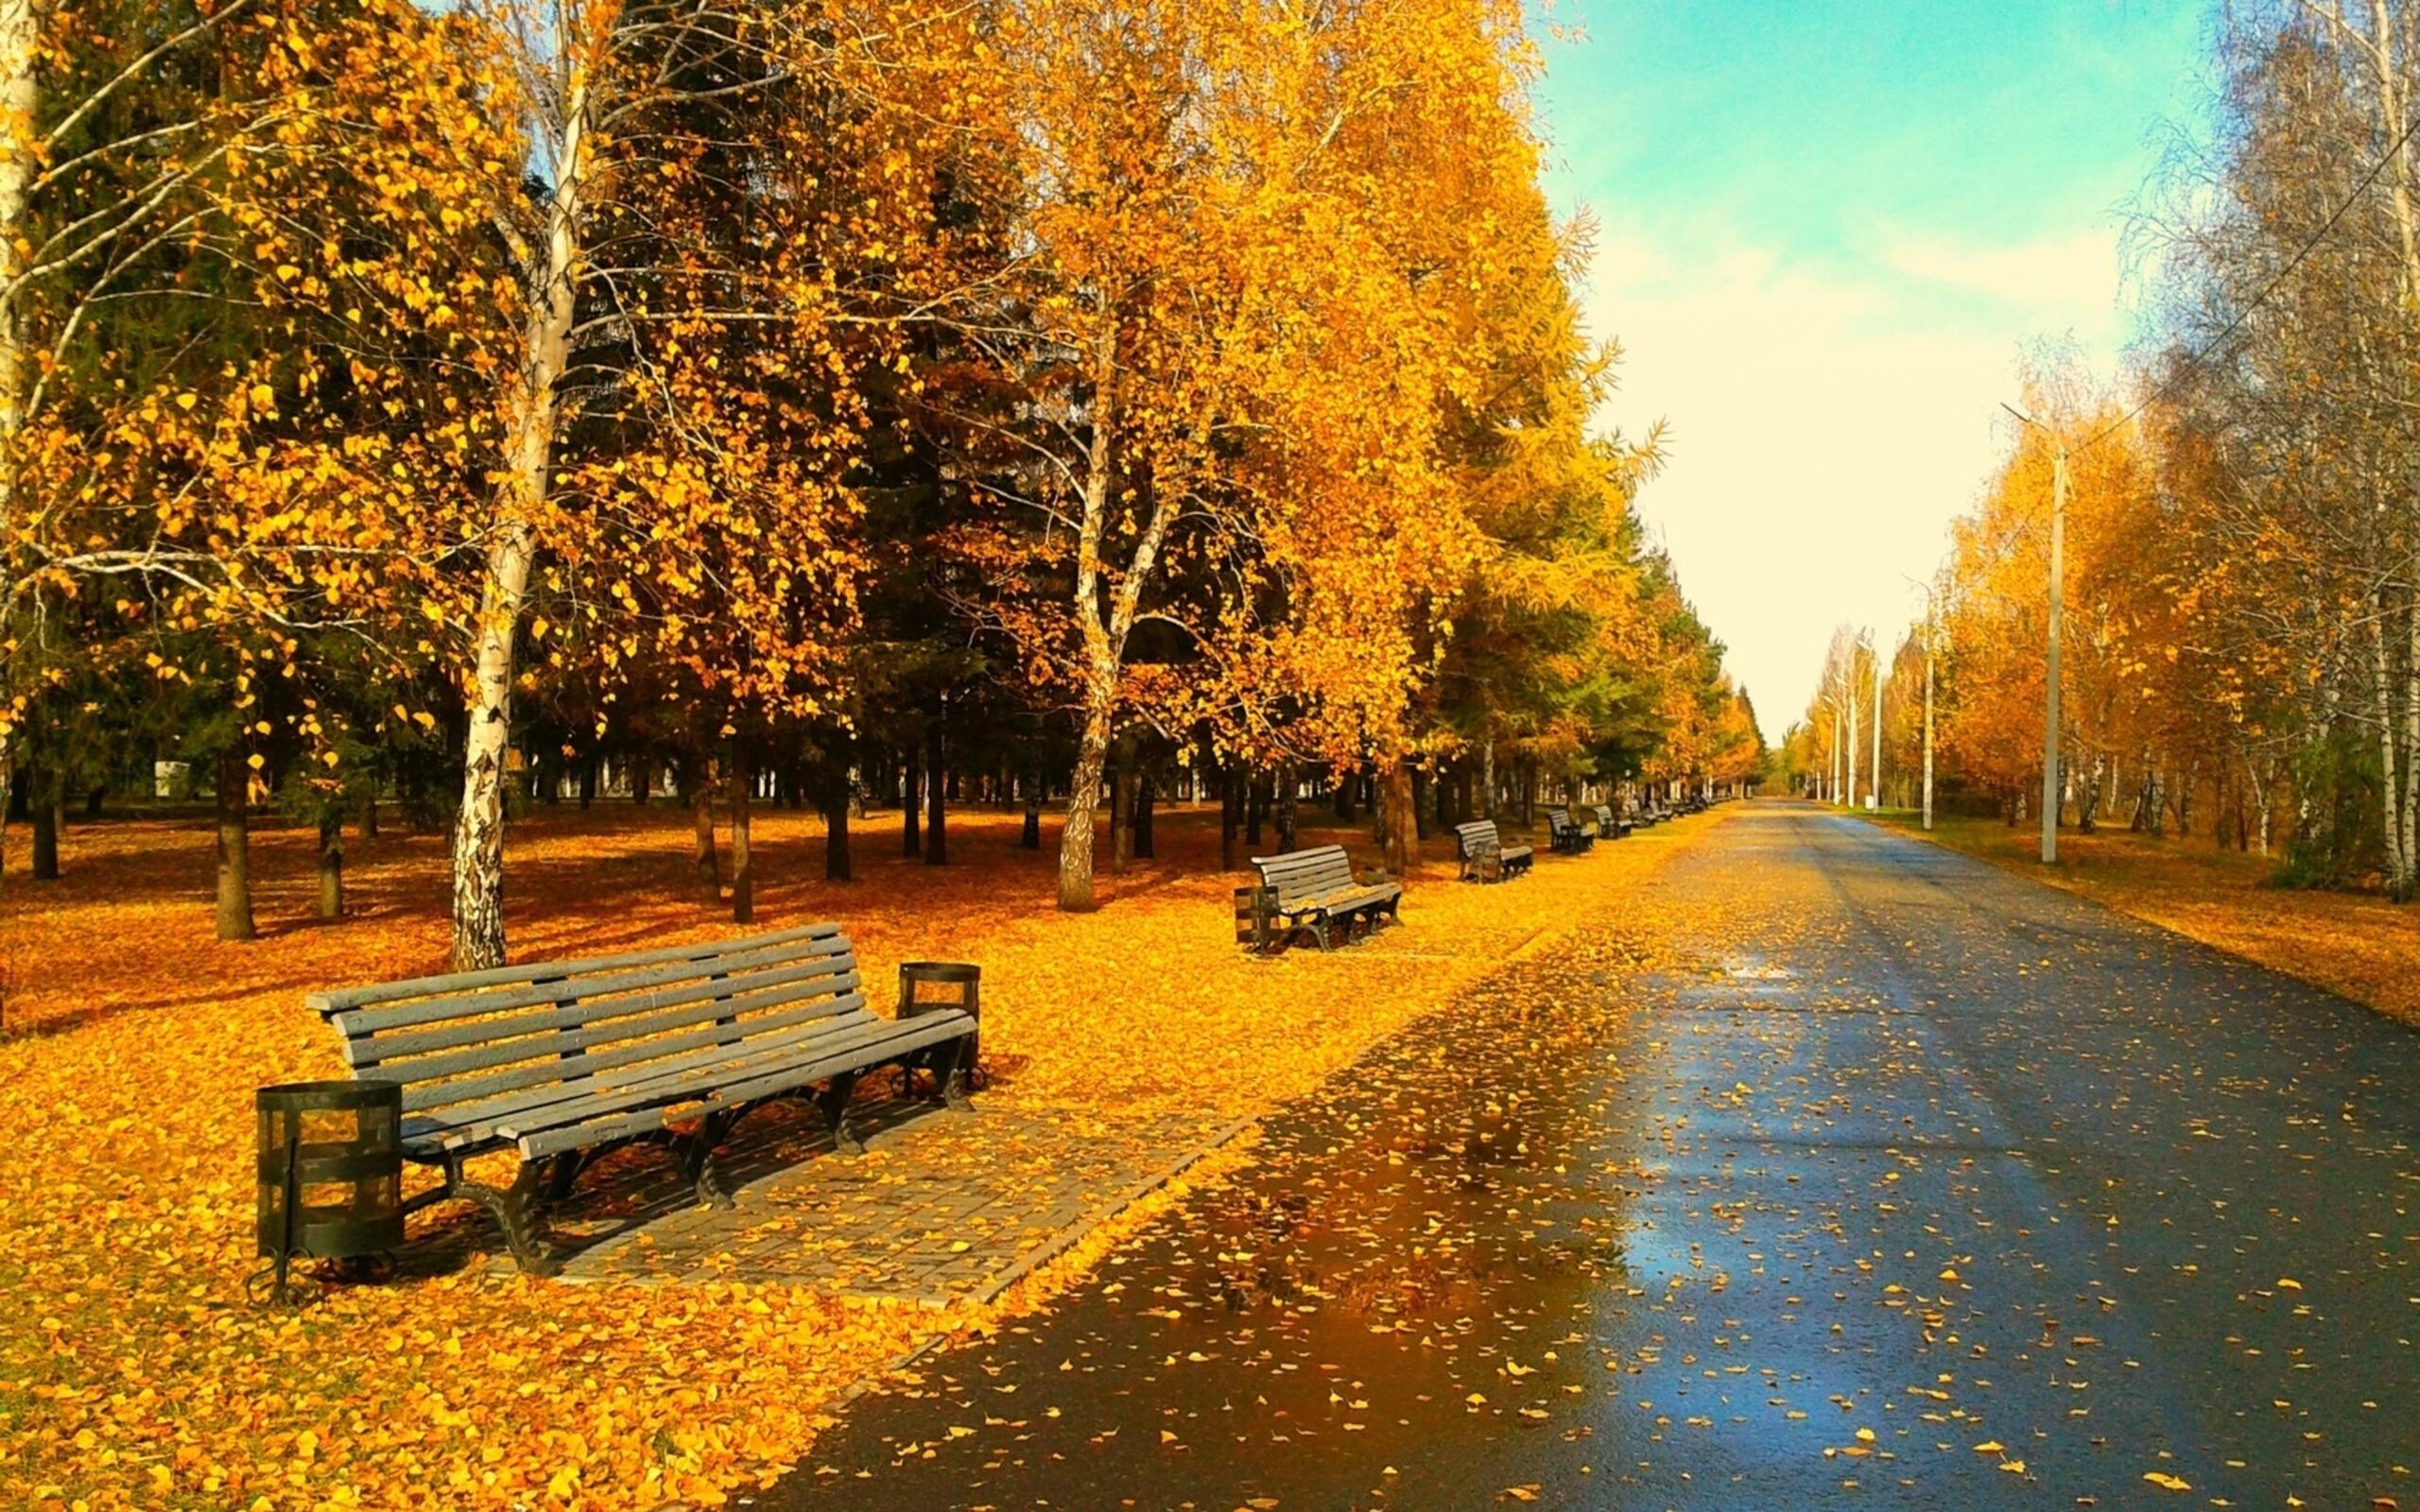 Sunny Autumn Day wallpapers Sunny Autumn Day stock photos 2560x1600